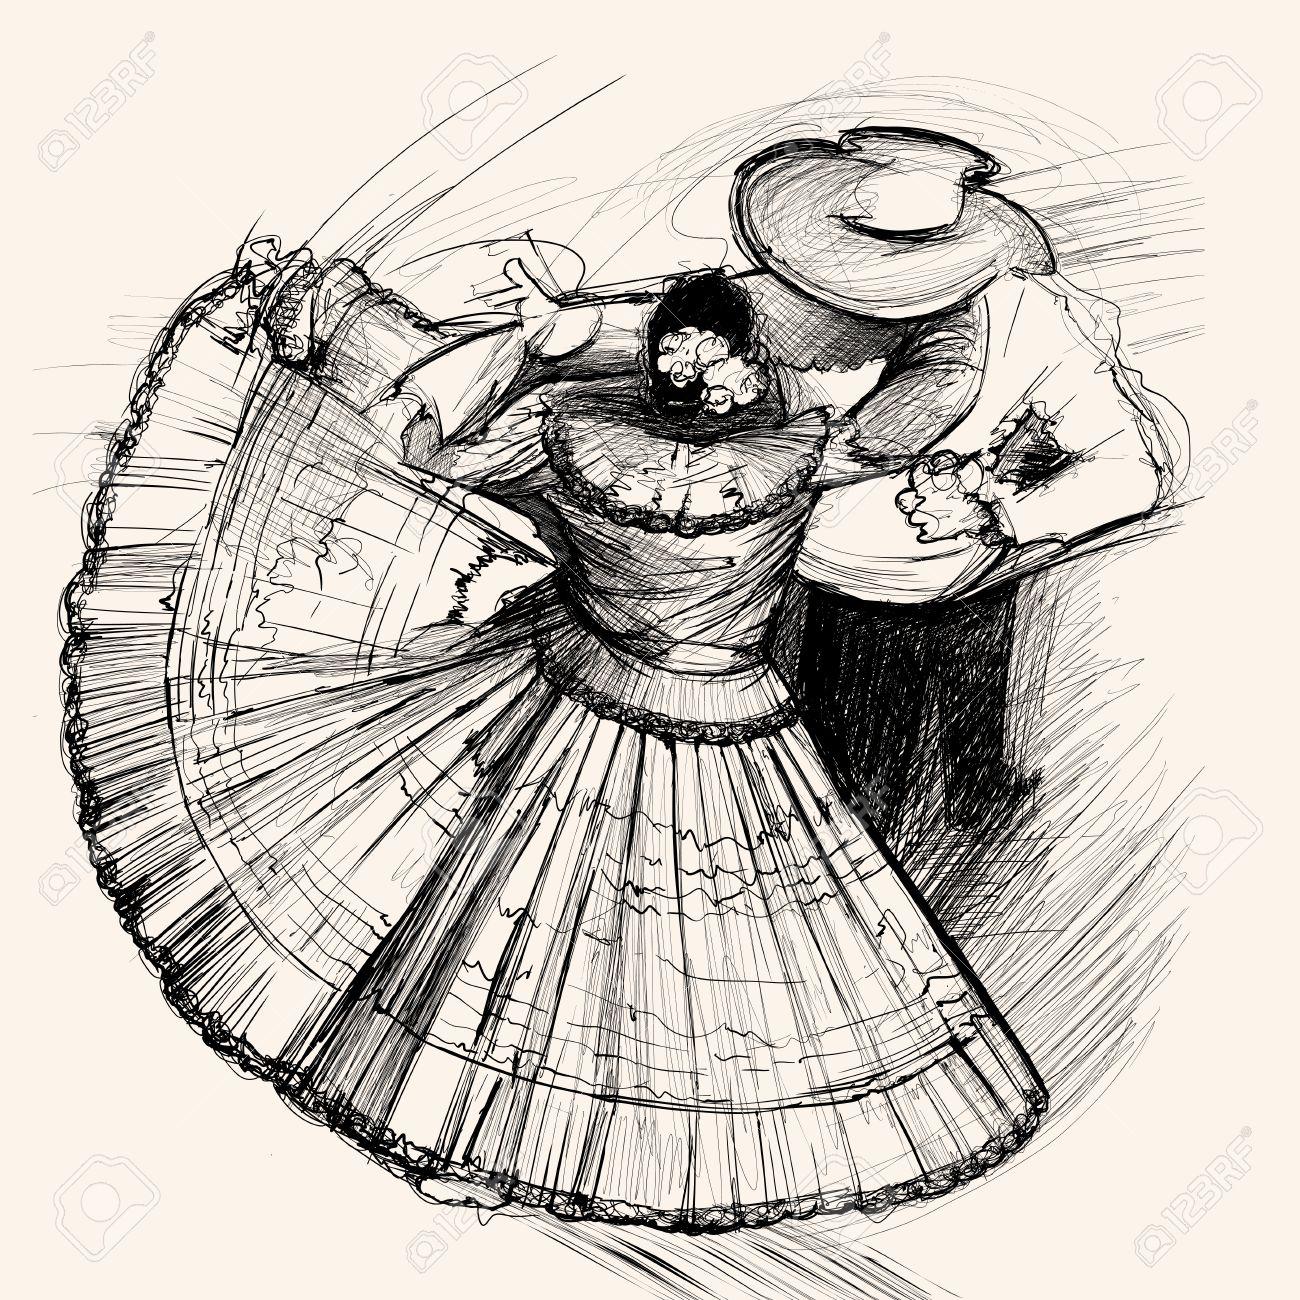 1300x1300 Illustration Of A Latino Dance Royalty Free Cliparts, Vectors,